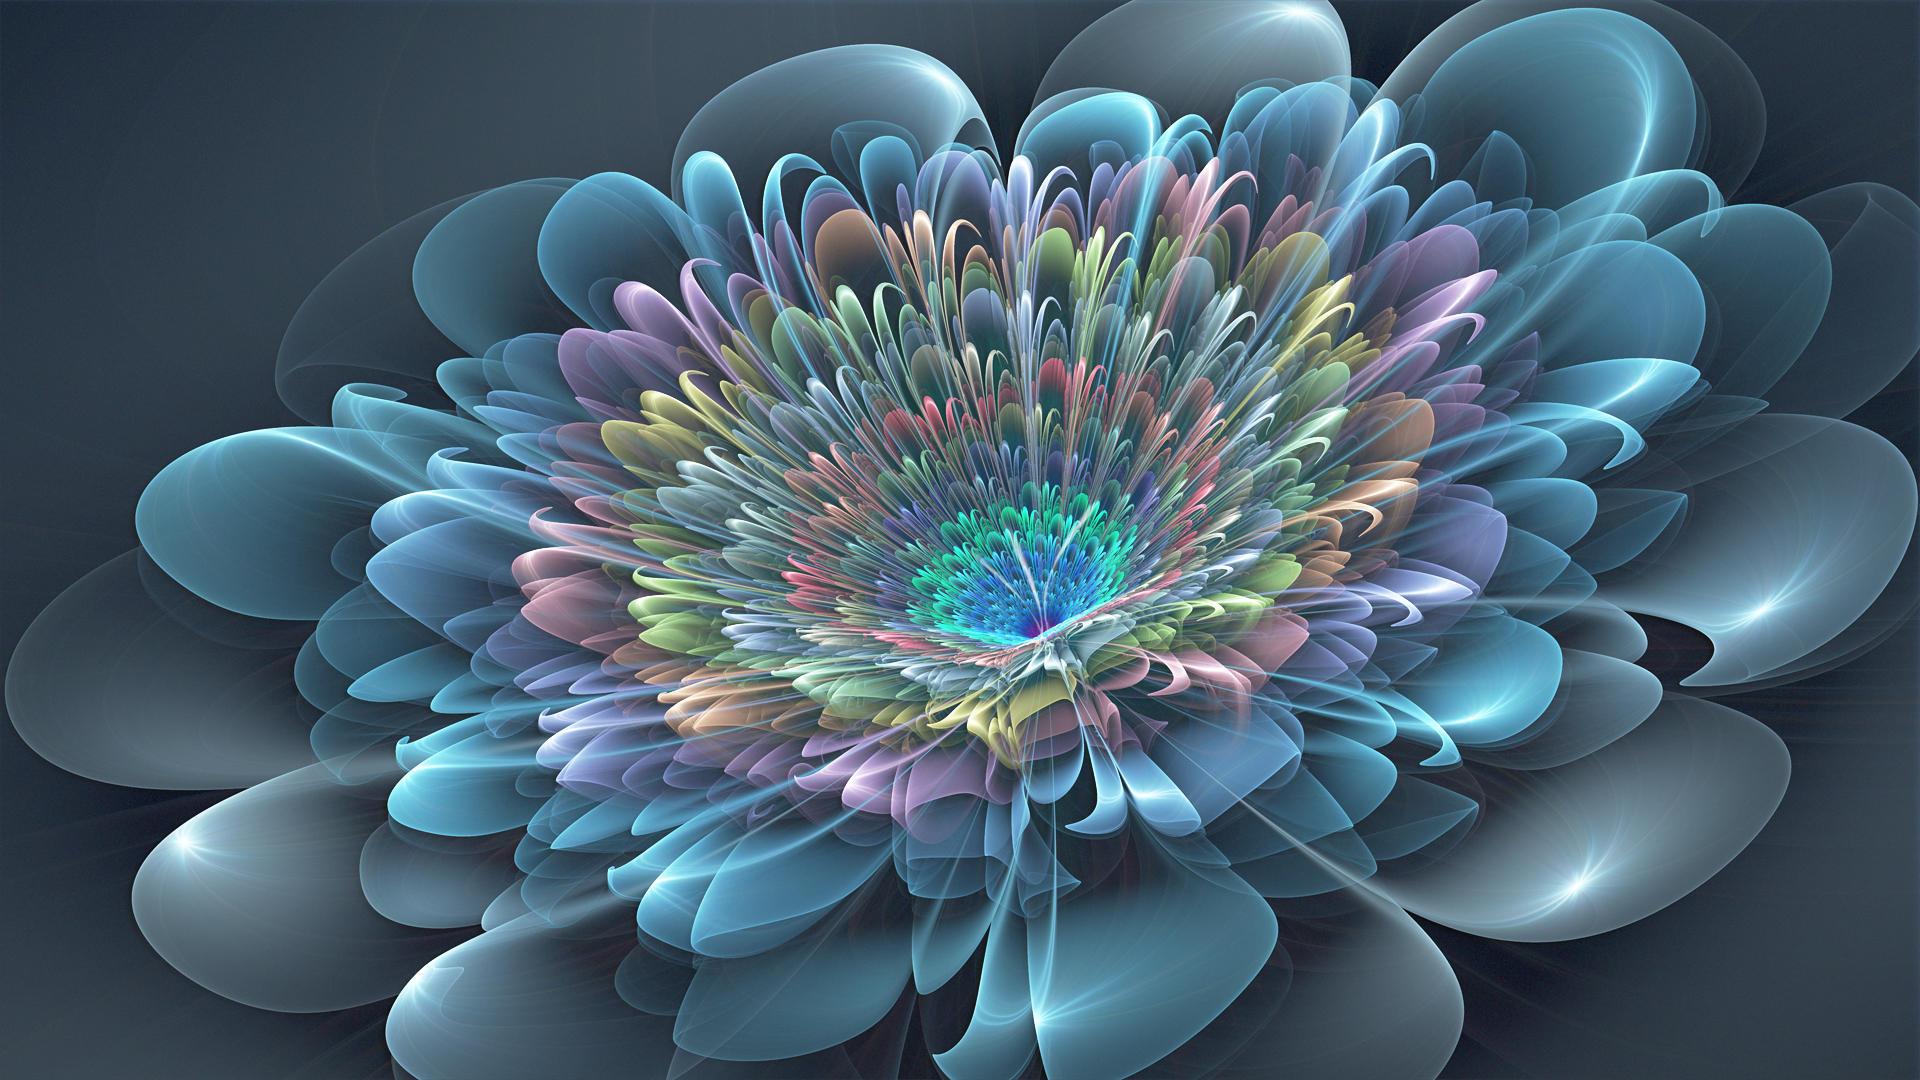 Multifacet Flower by Frankief